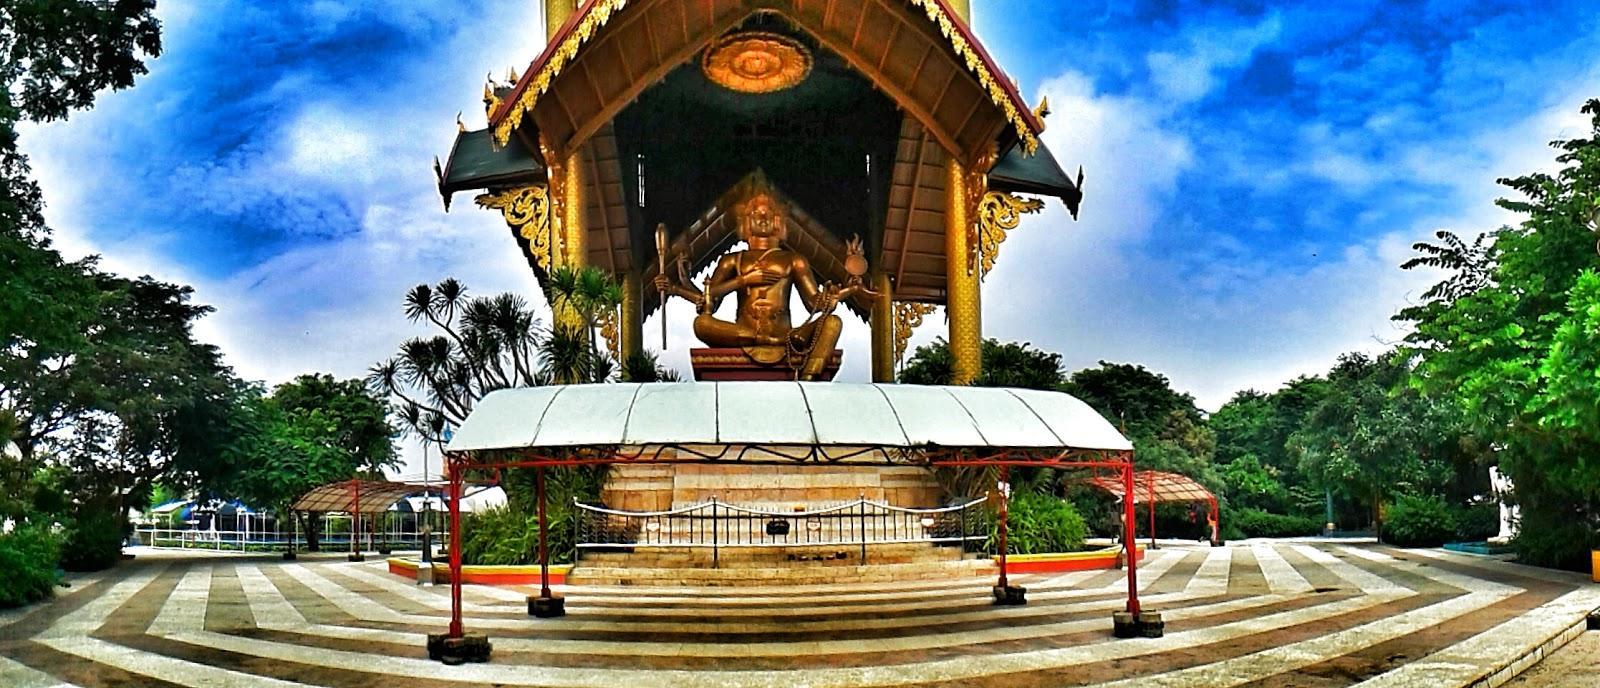 Tempat Wisata Surabaya Tak Dilewatkan Sportourism Id Patung Buddha Empat